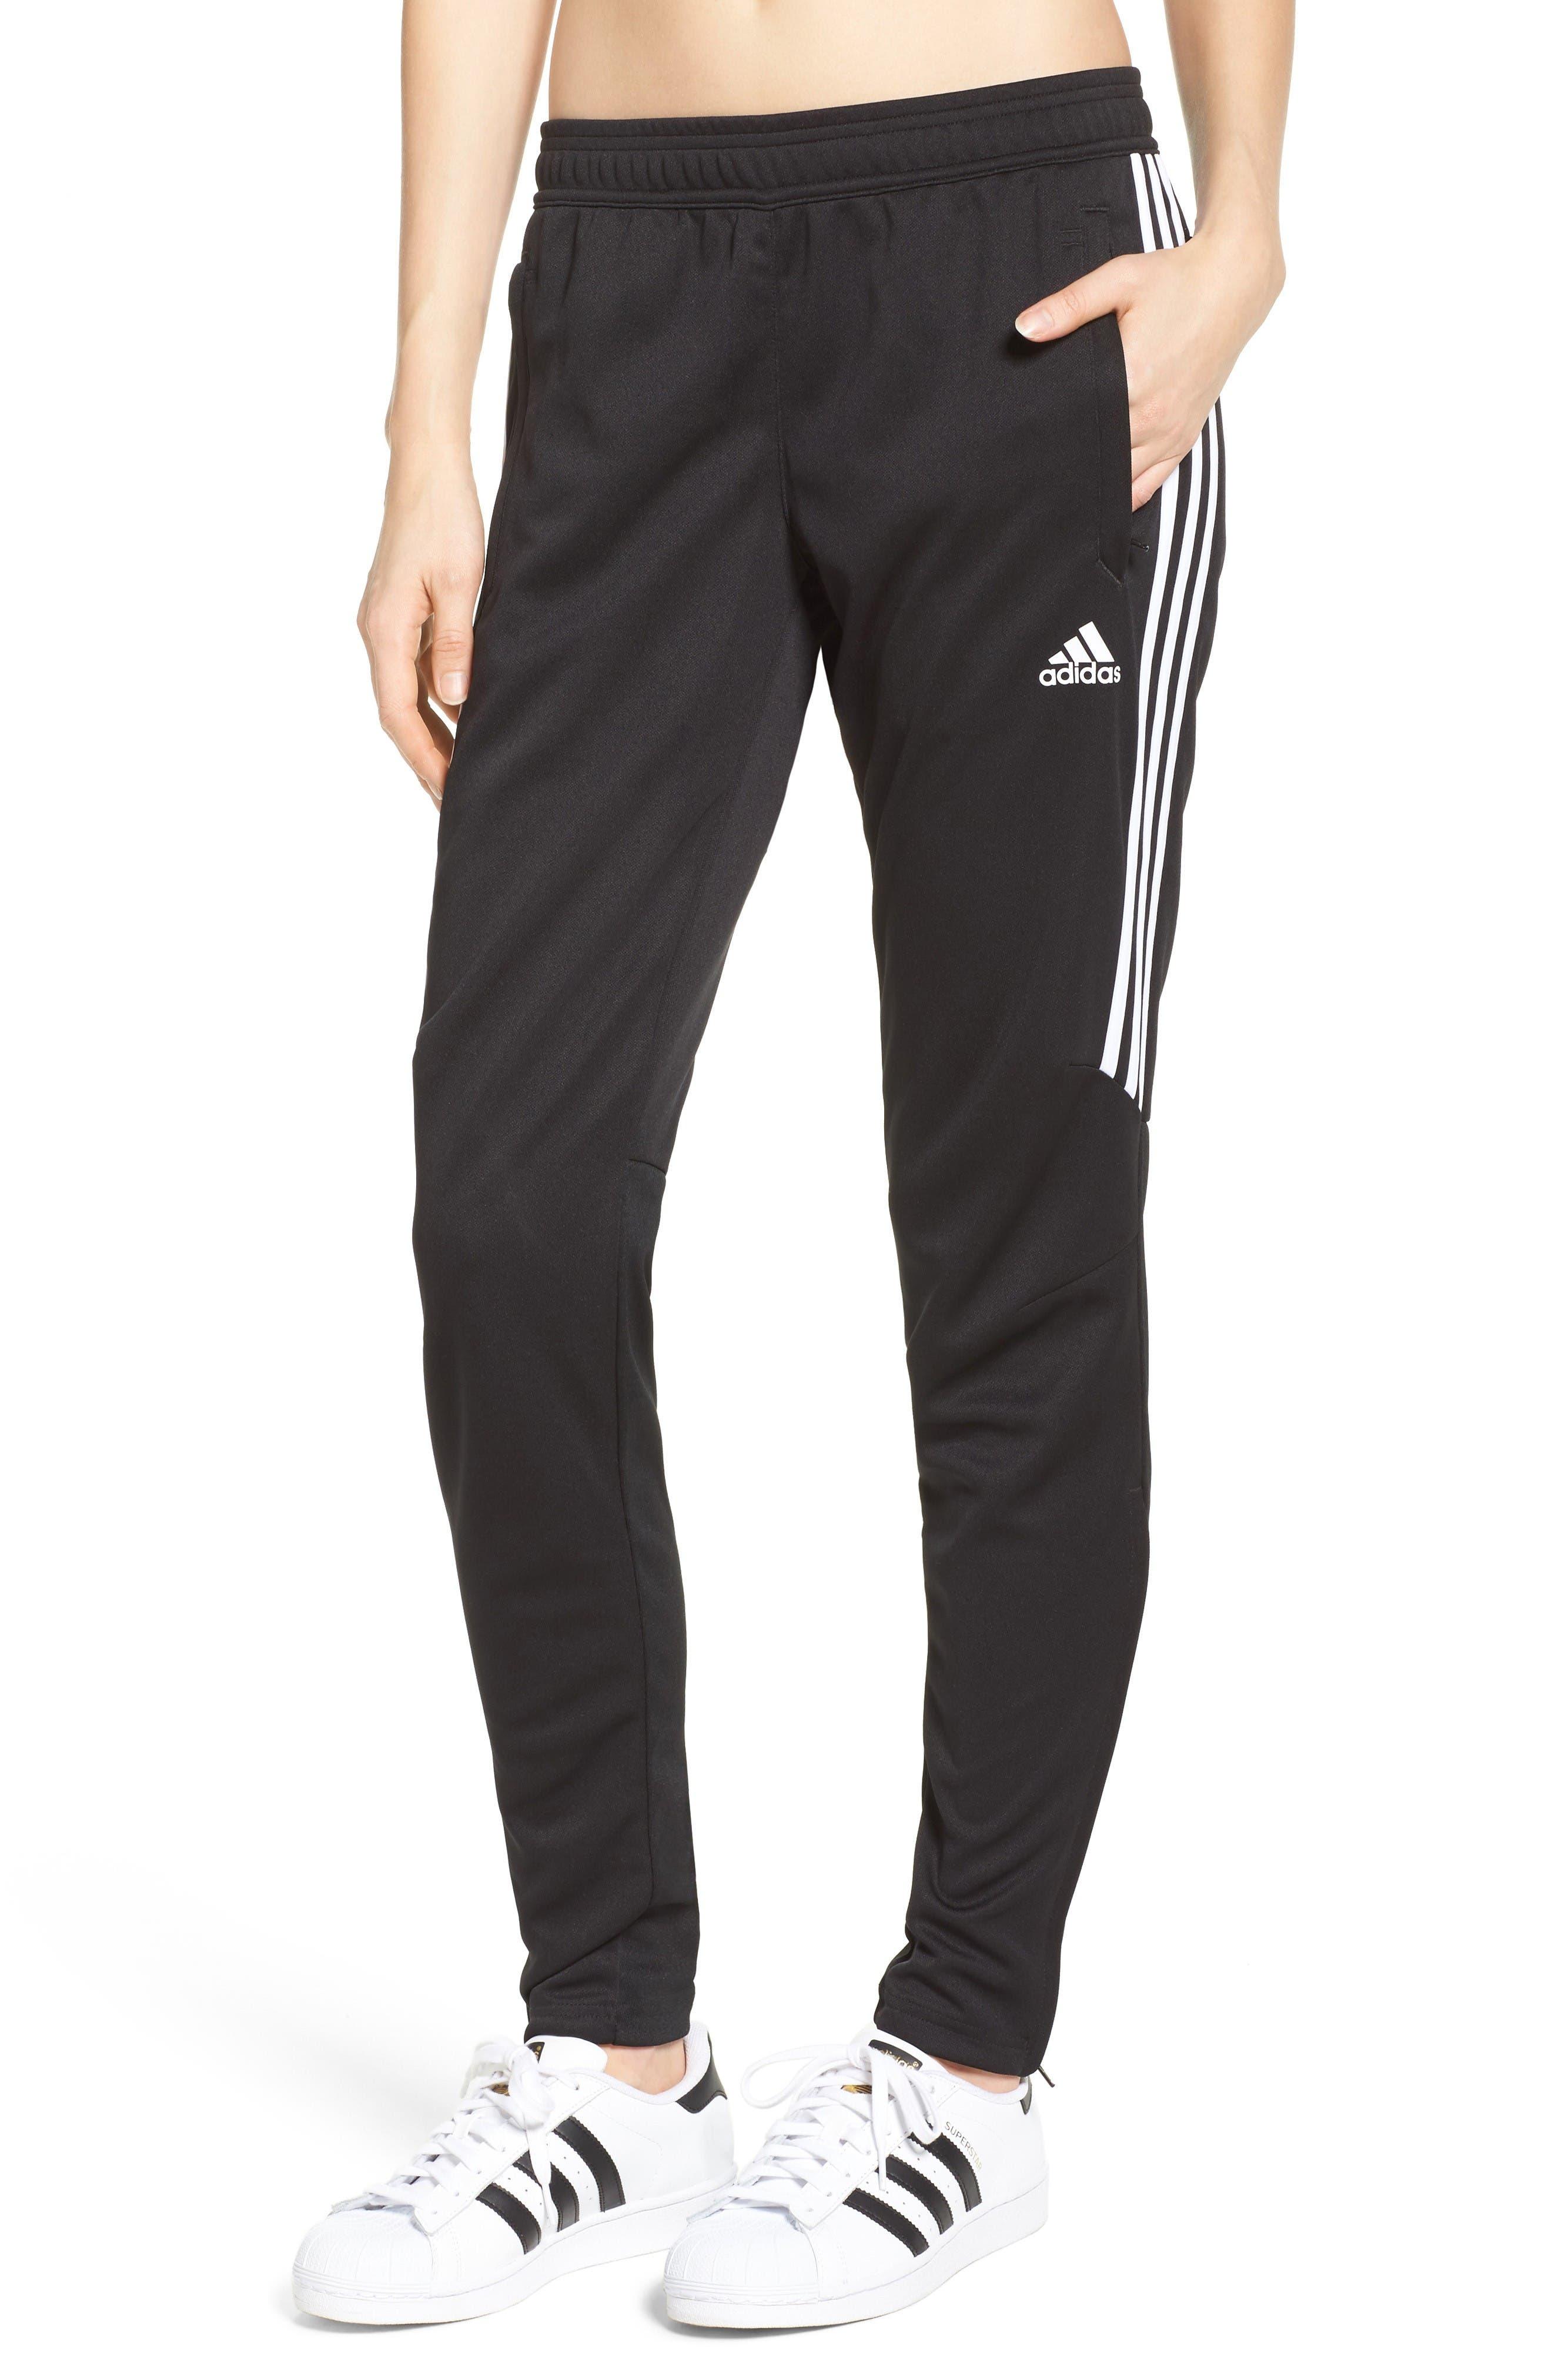 adidas Trio 17 Training Pants